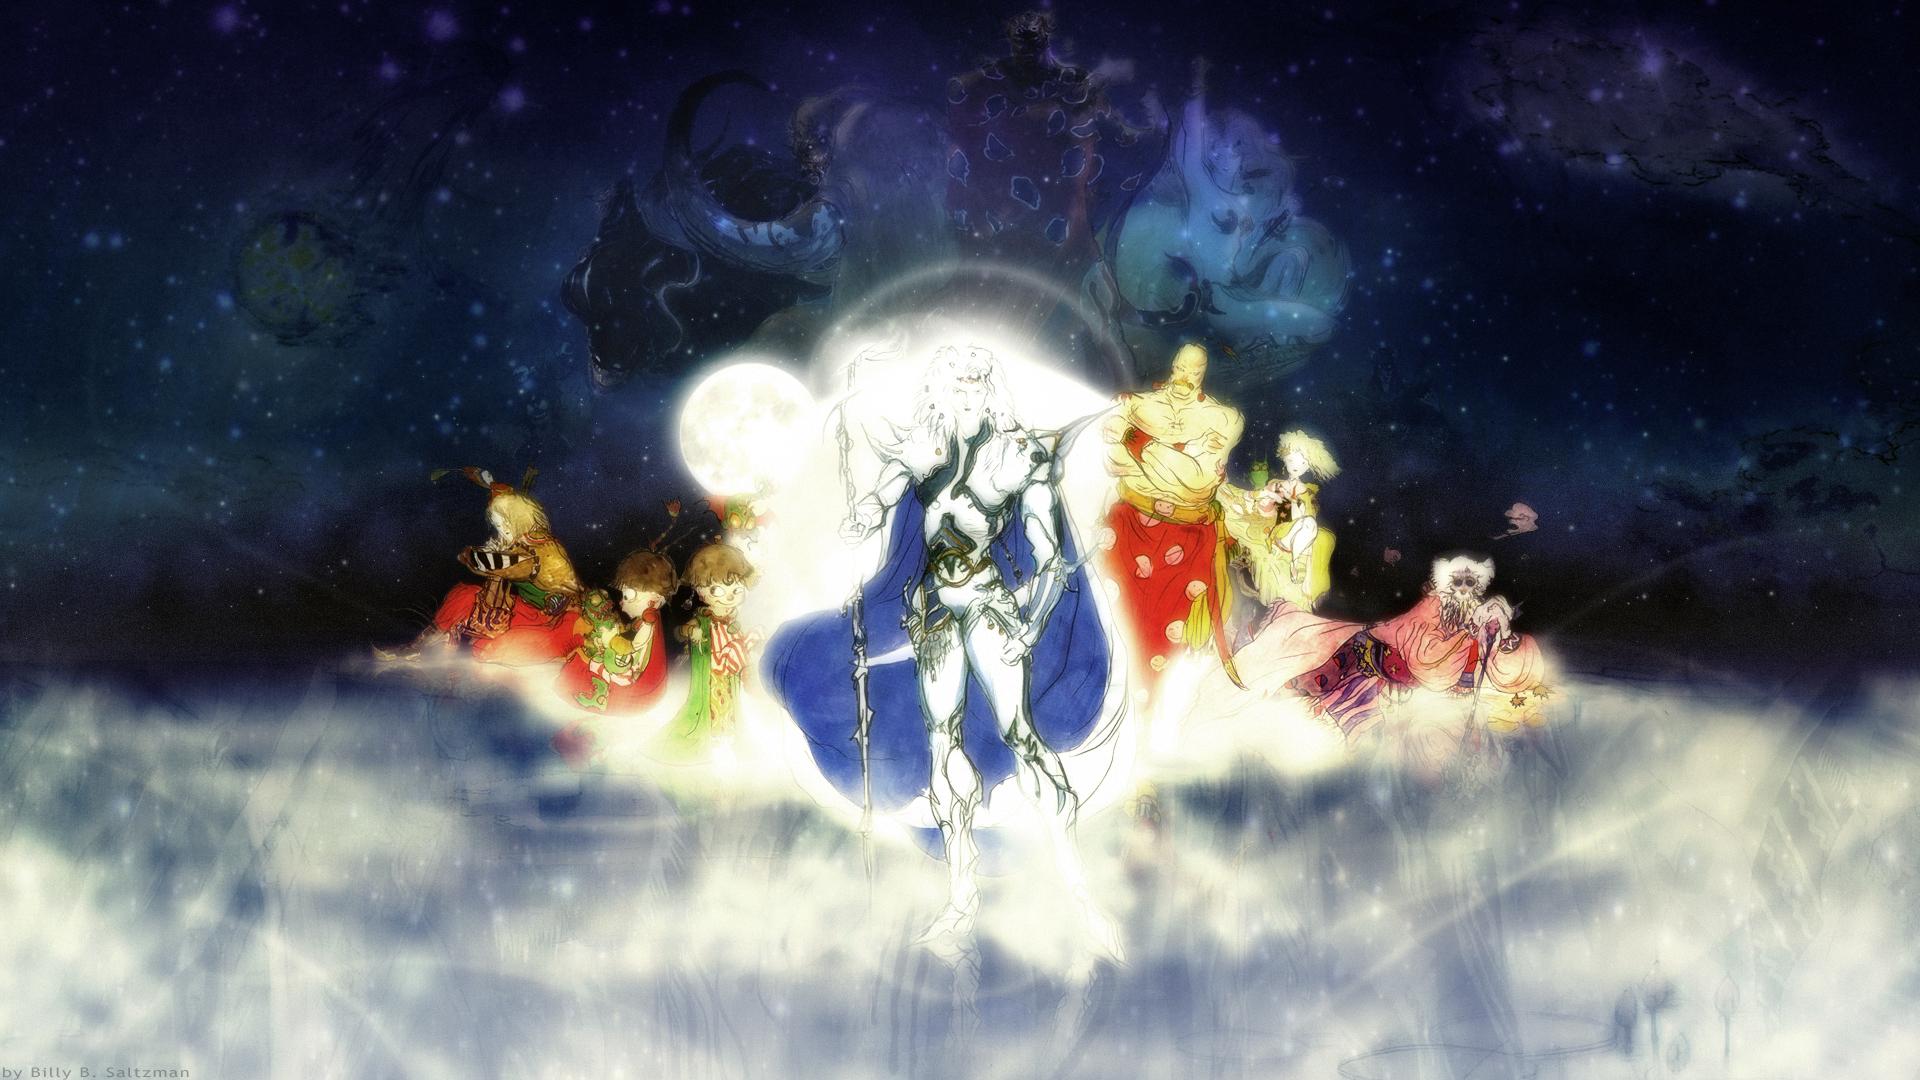 Final Fantasy IV Wallpaper 1 by Billysan291 on DeviantArt